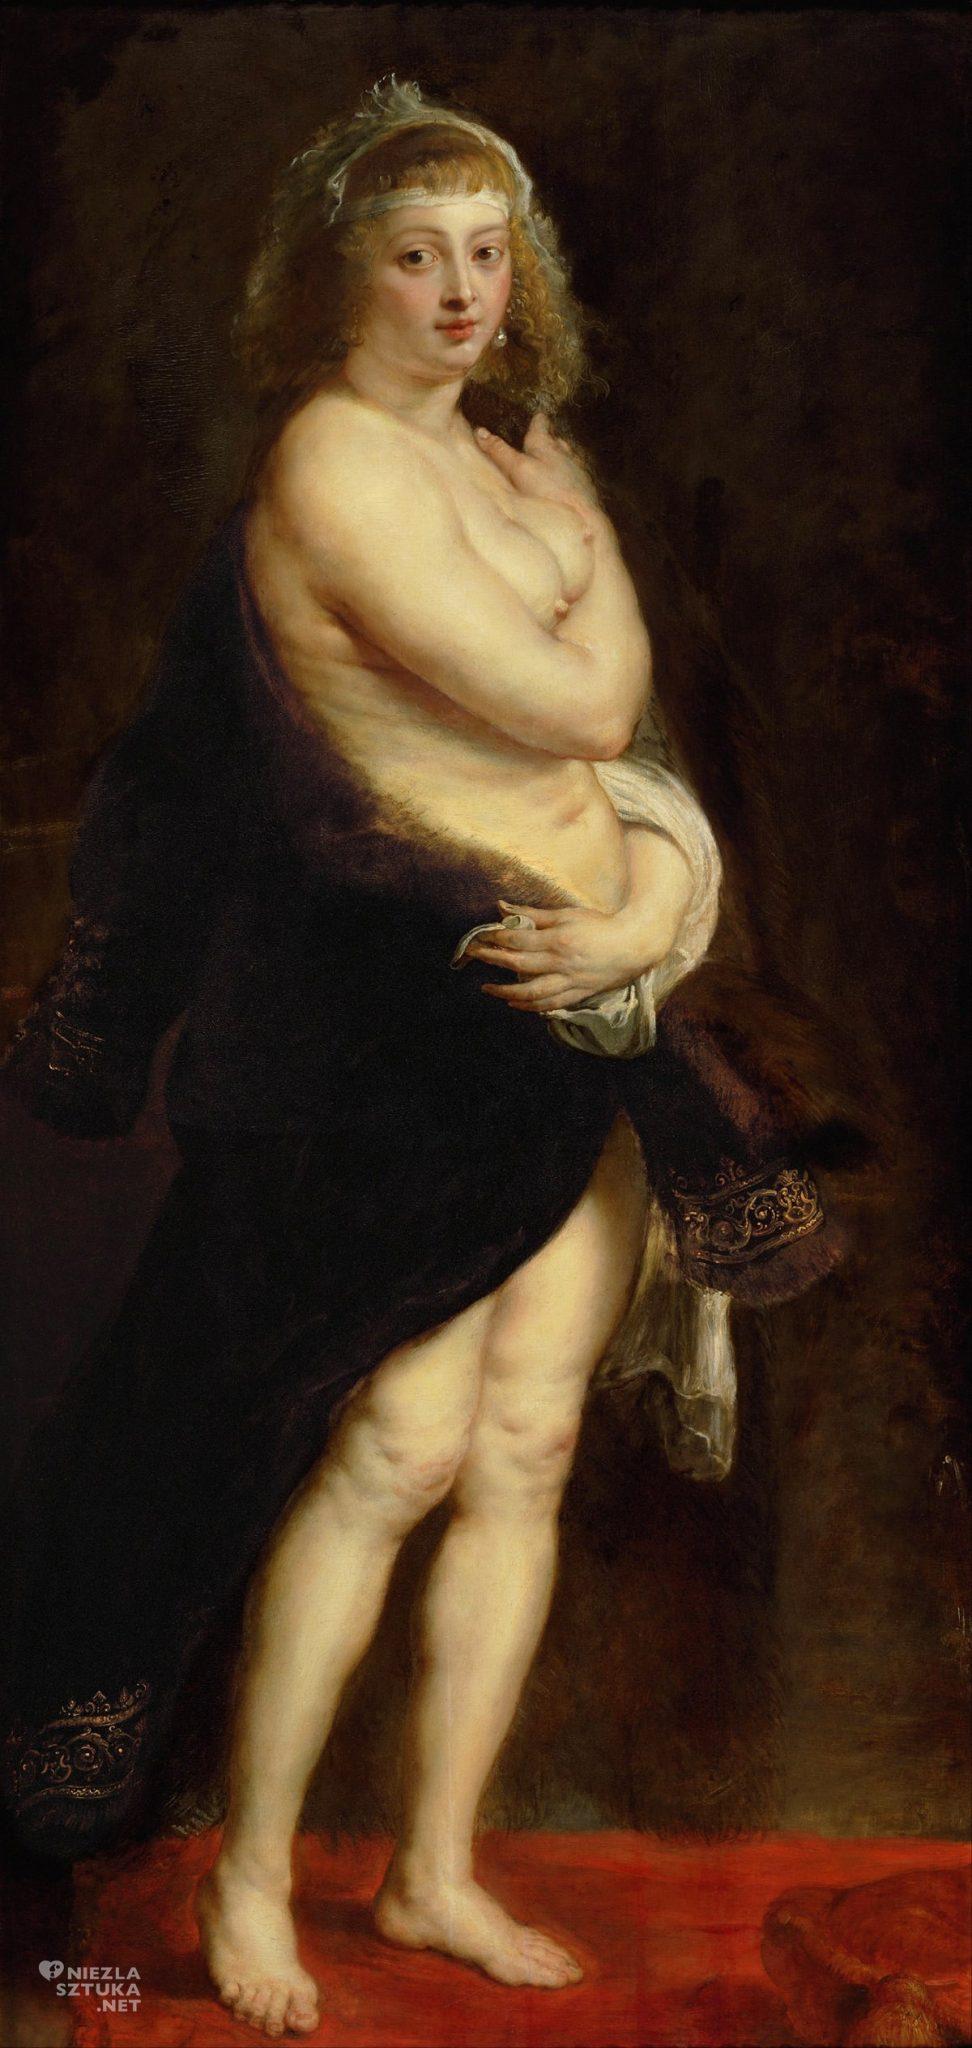 Peter Paul Rubens, Helena Fourment, Portret Heleny Fourment w futrze, portret żony w futrze, malarstwo flamandzkie, niezła sztuka